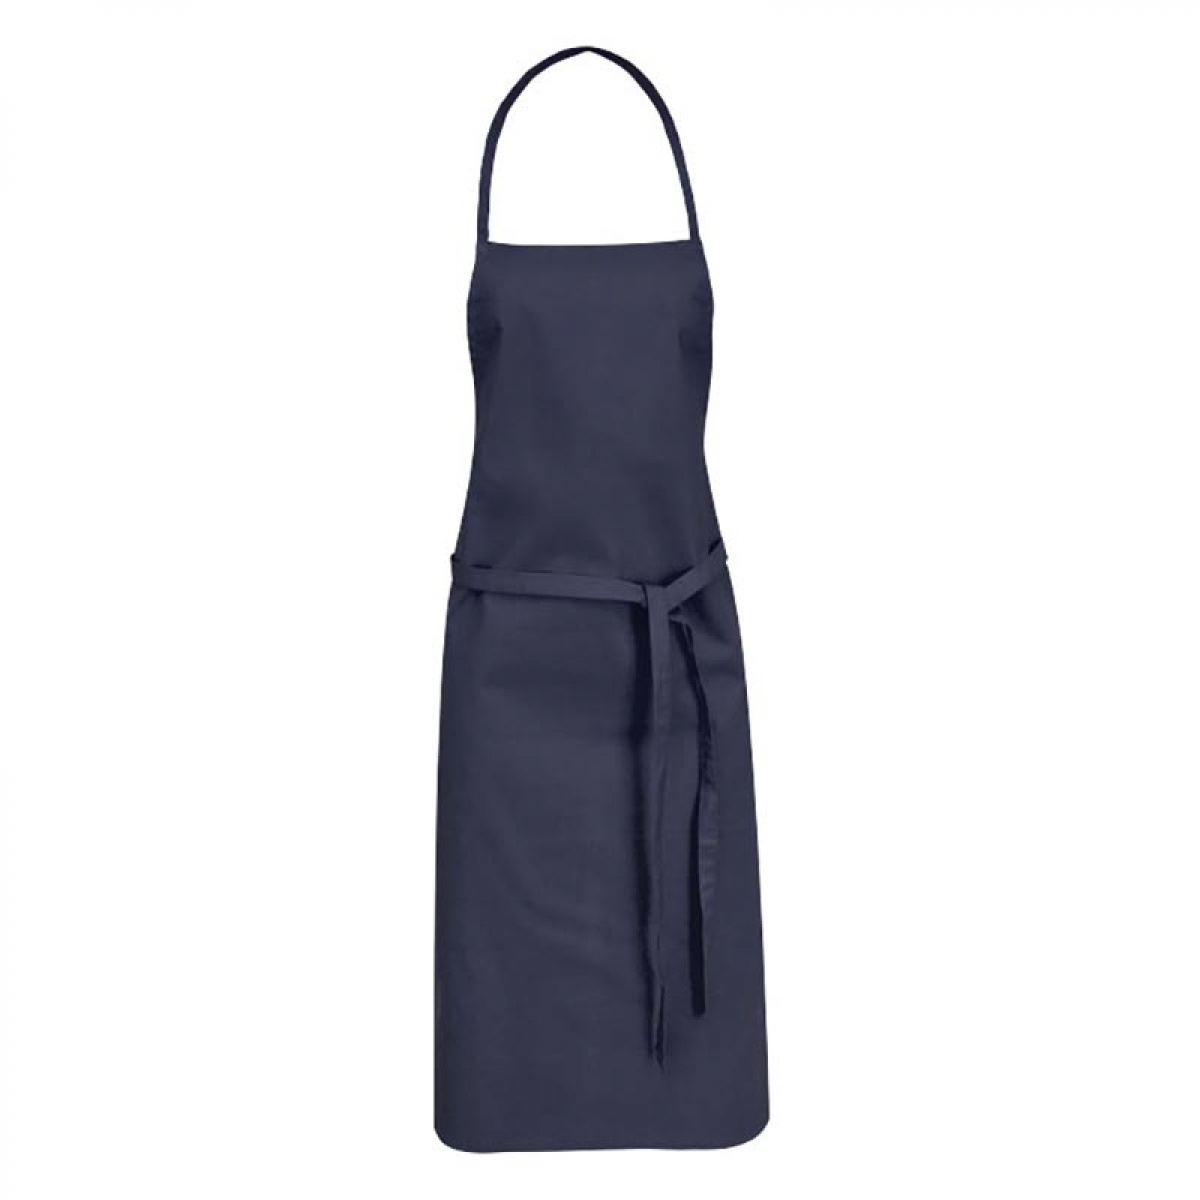 Förkläde Cook